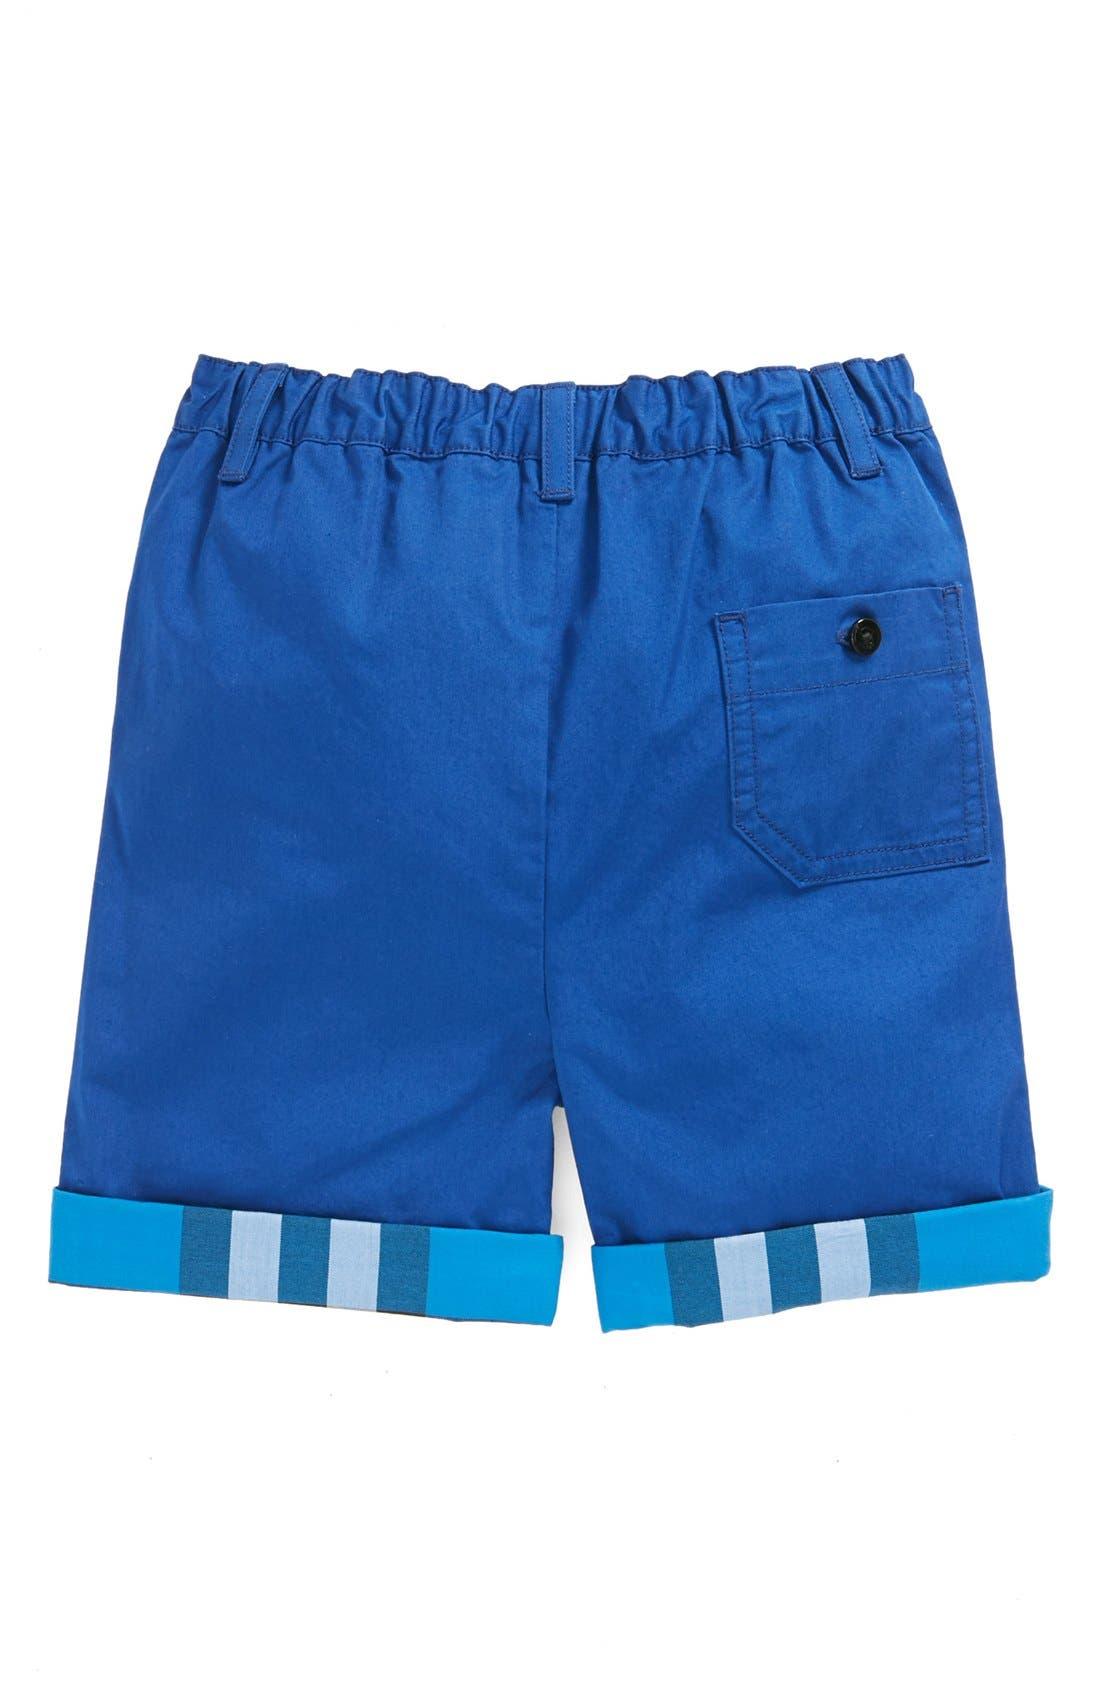 Alternate Image 2  - Burberry 'Seth' Shorts (Toddler Boys)